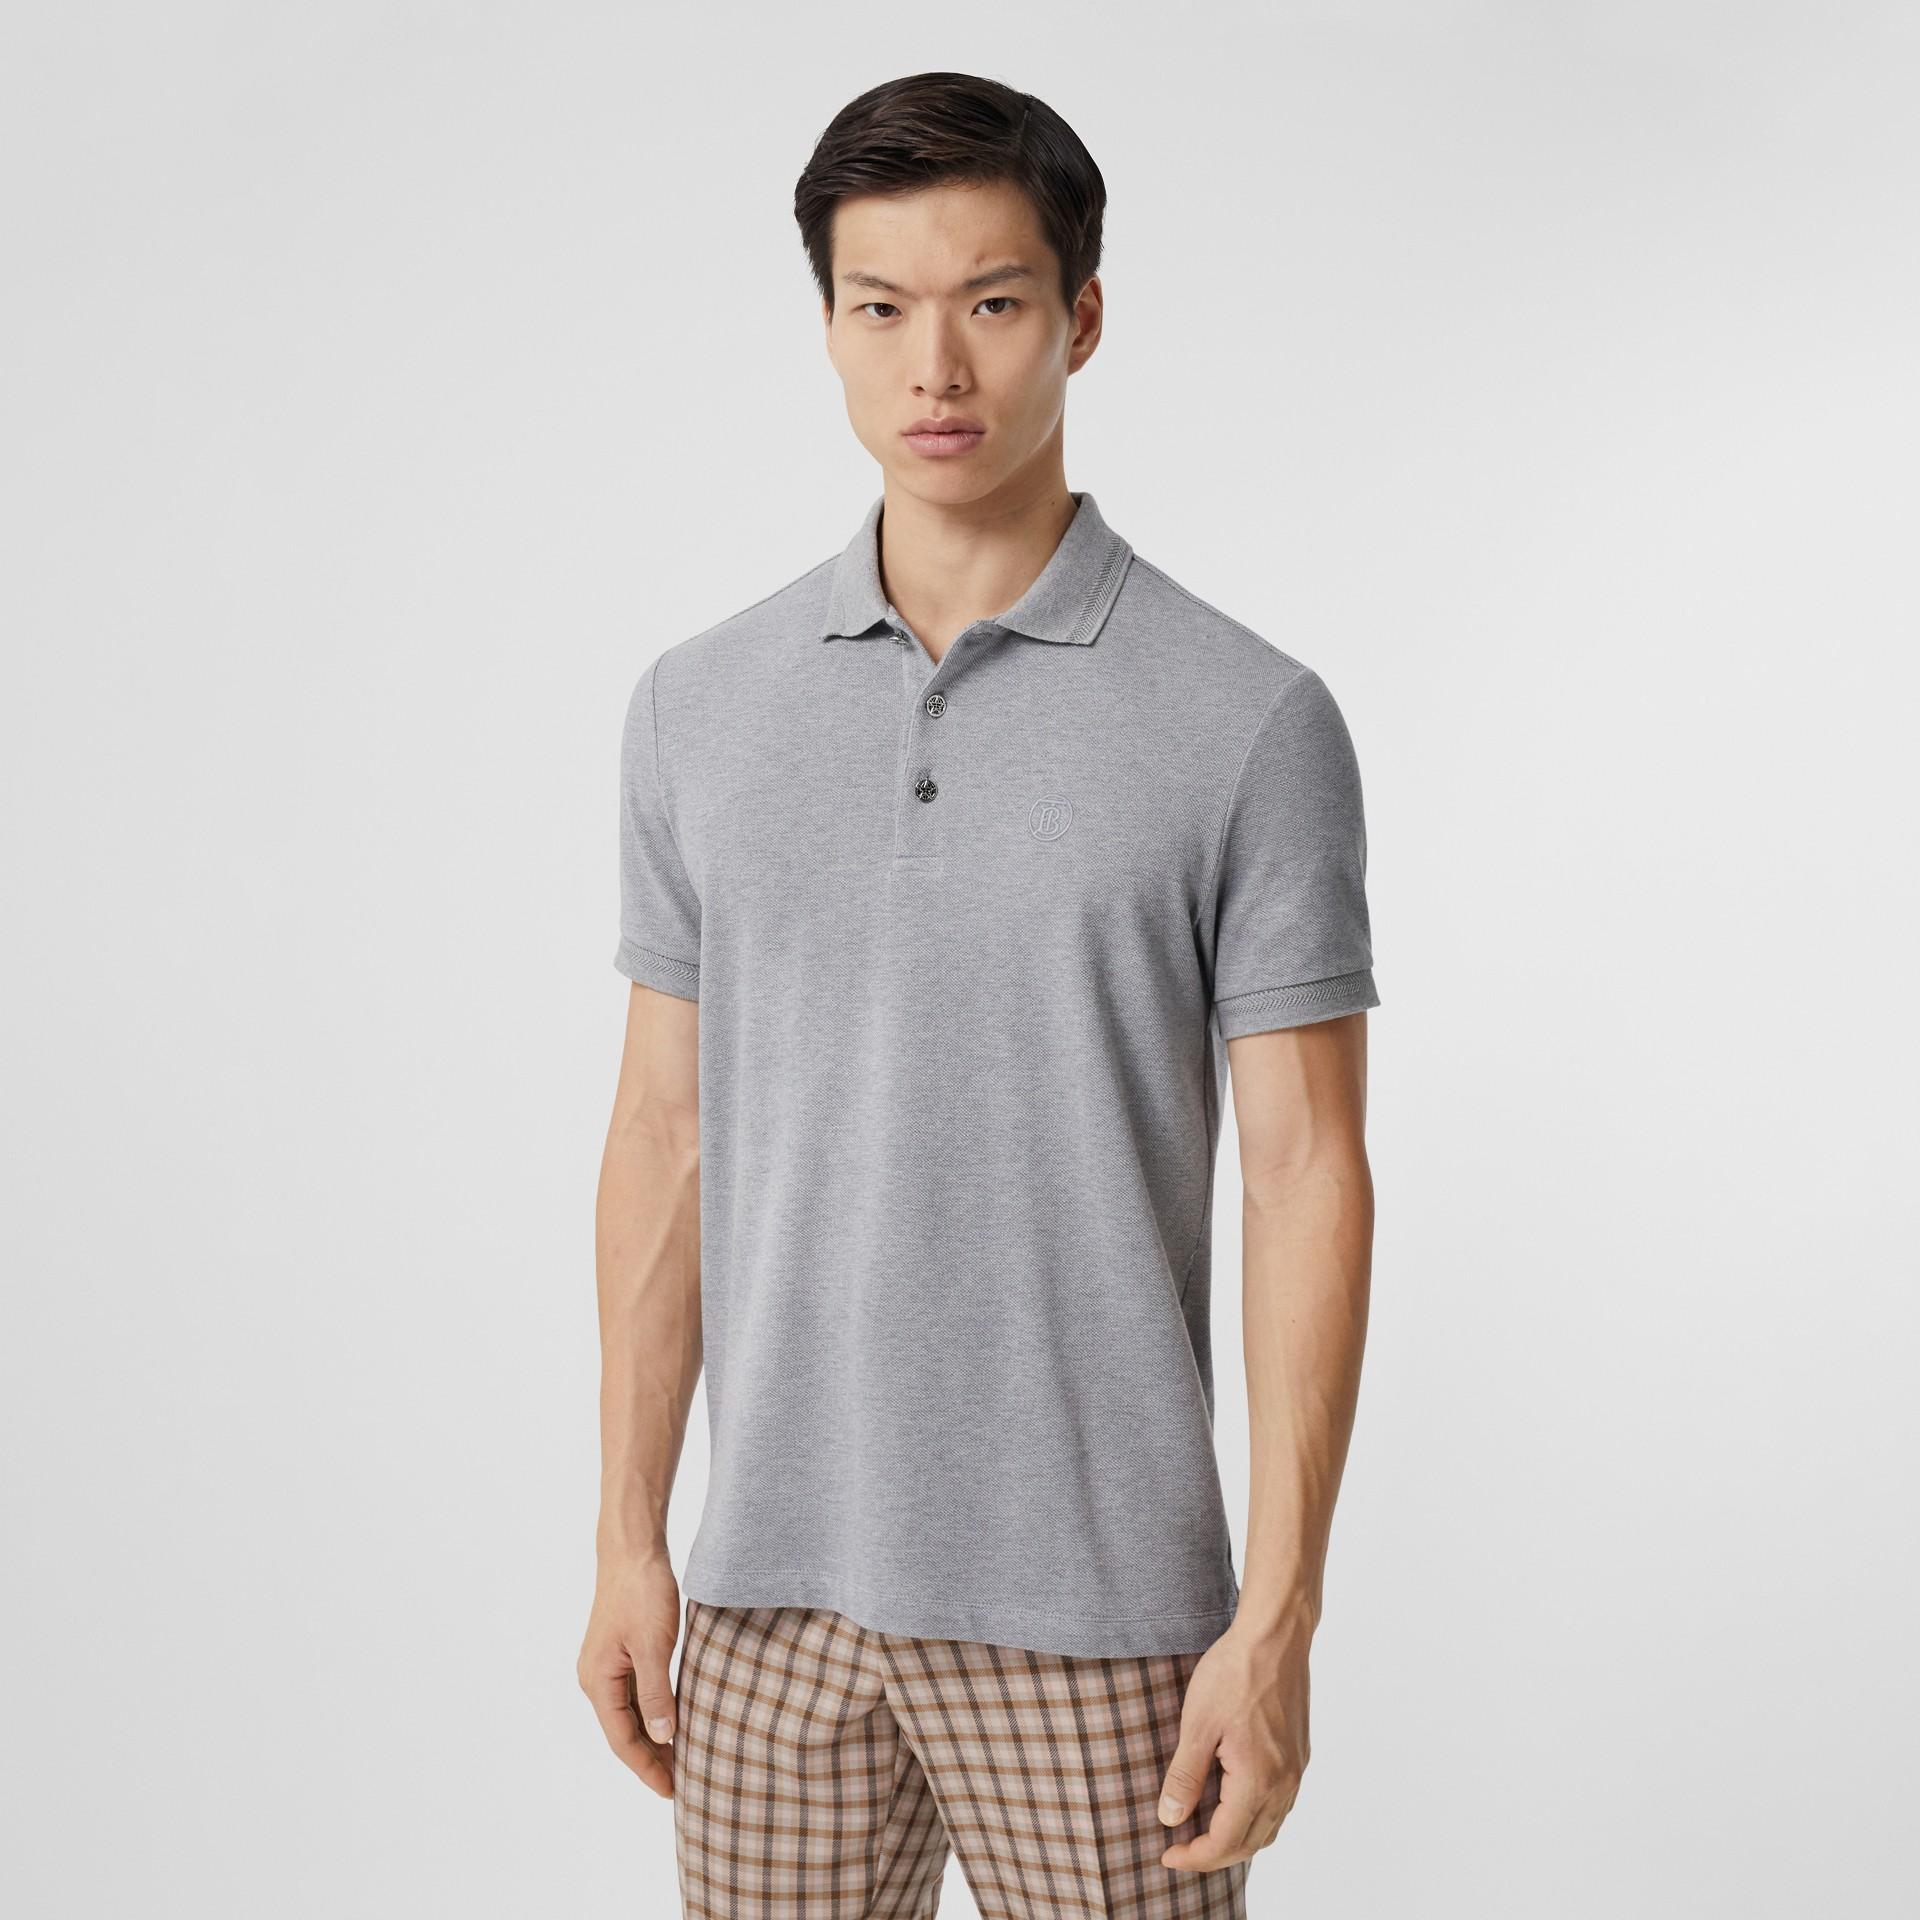 Button Detail Cotton Piqué Polo Shirt in Pale Grey Melange - Men | Burberry - gallery image 0